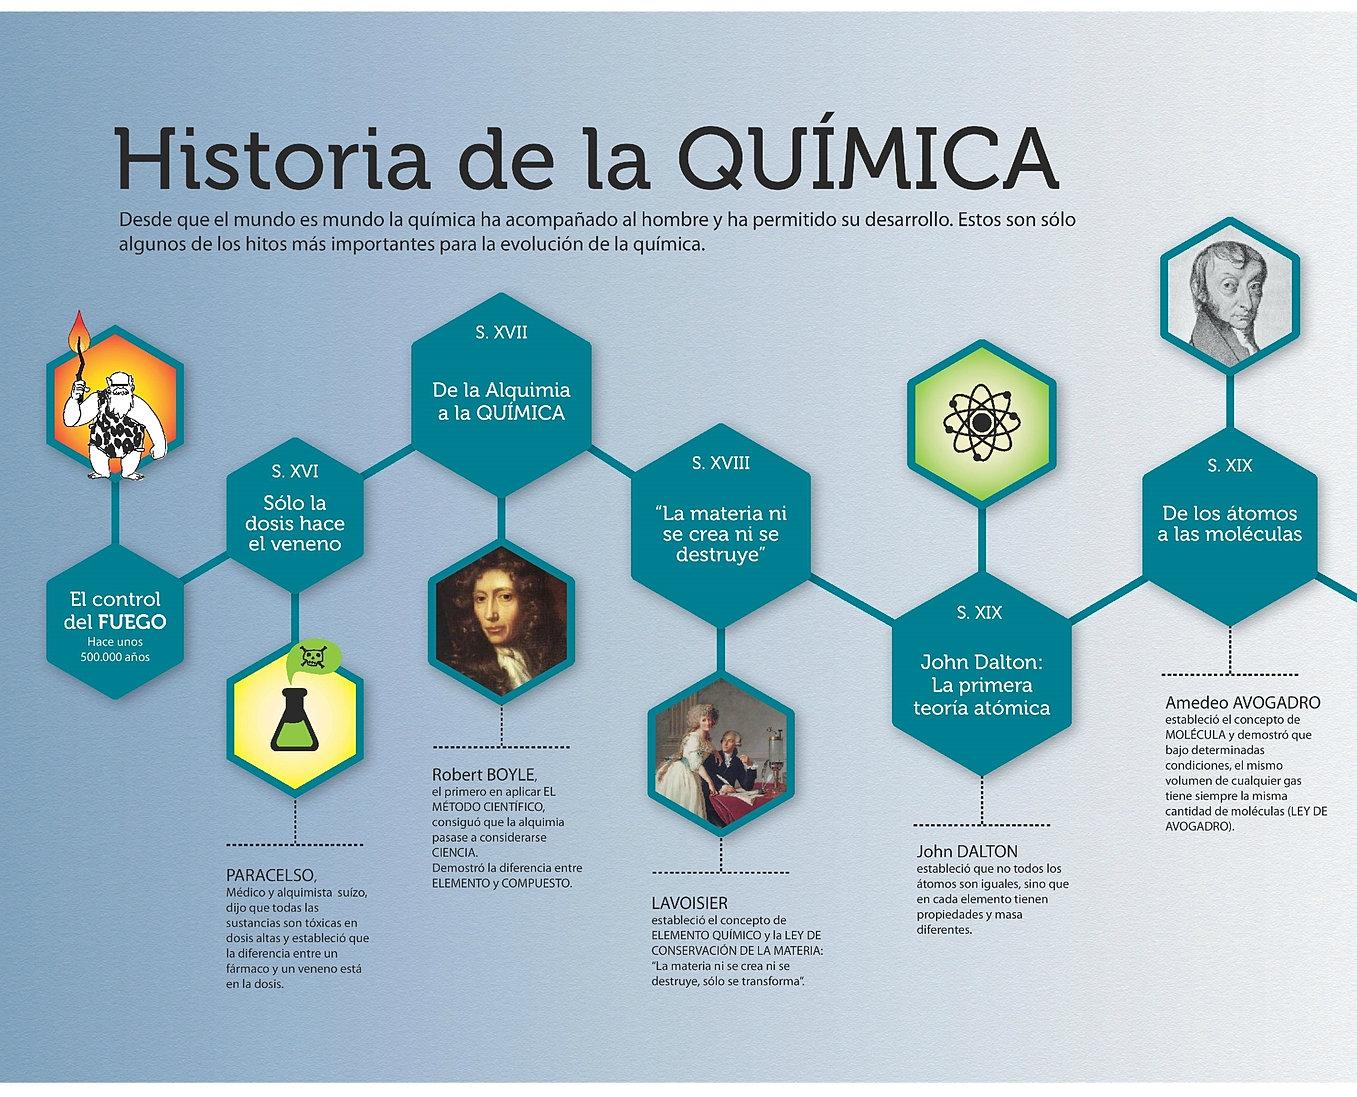 Innova for La quimica en la gastronomia